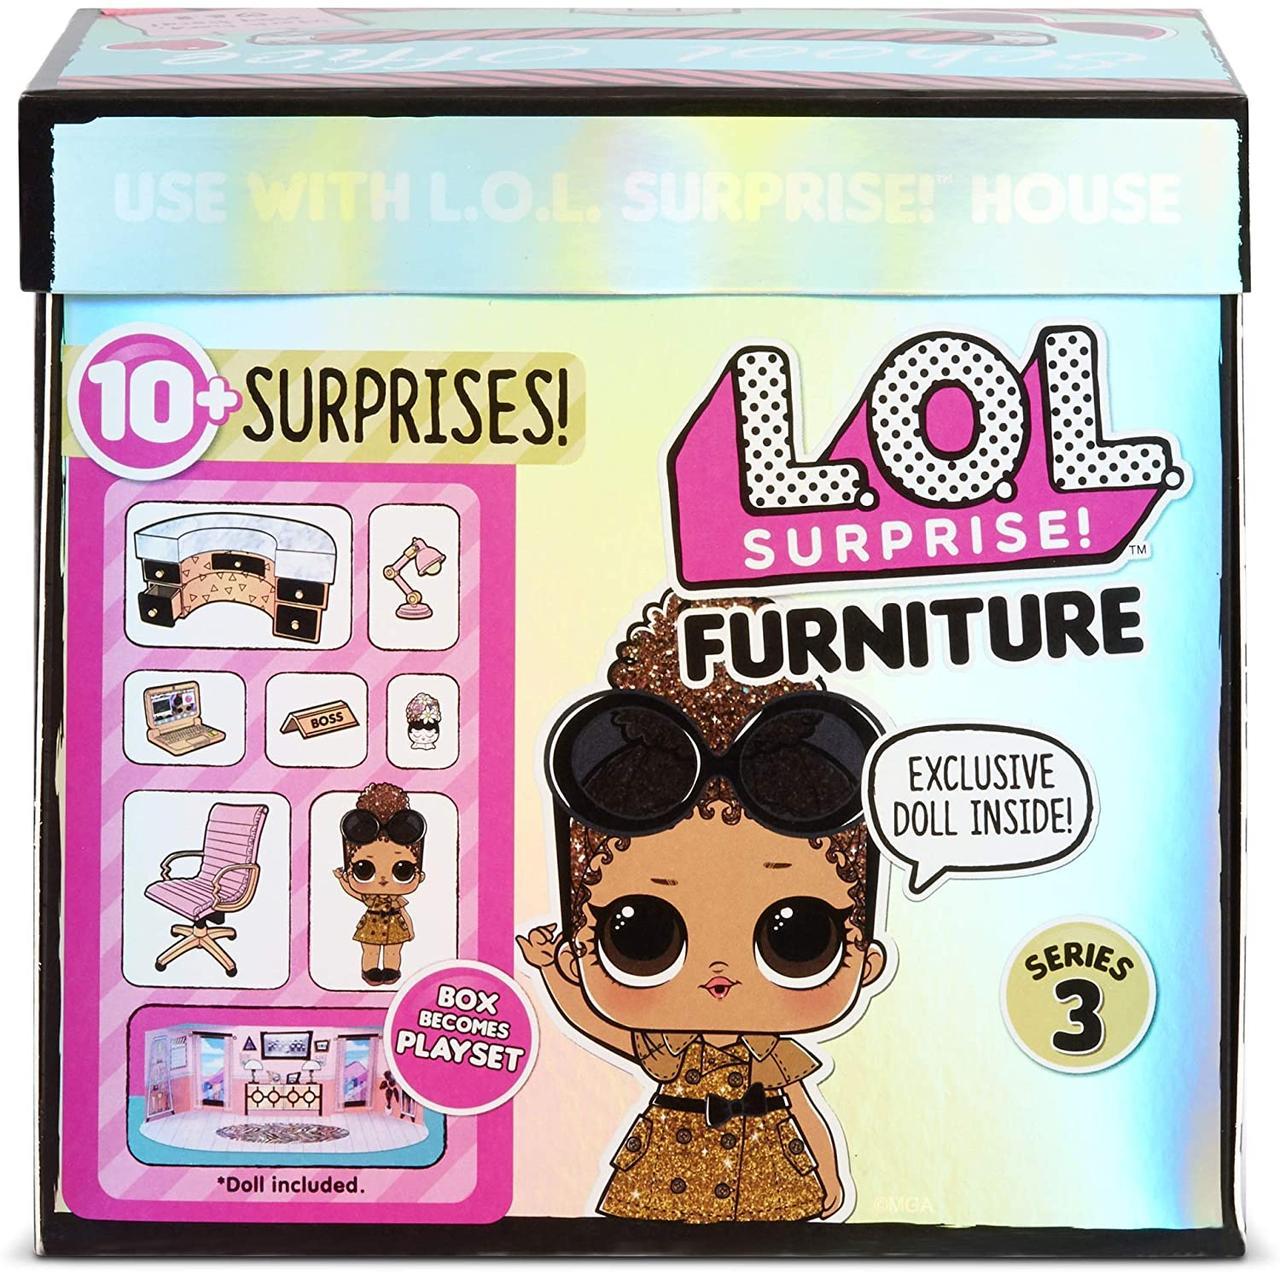 Мебель для куклы ЛОЛ Сюрприз Кабинет Леди-Босс - LOL Surprise Furniture Boss Queen 570042